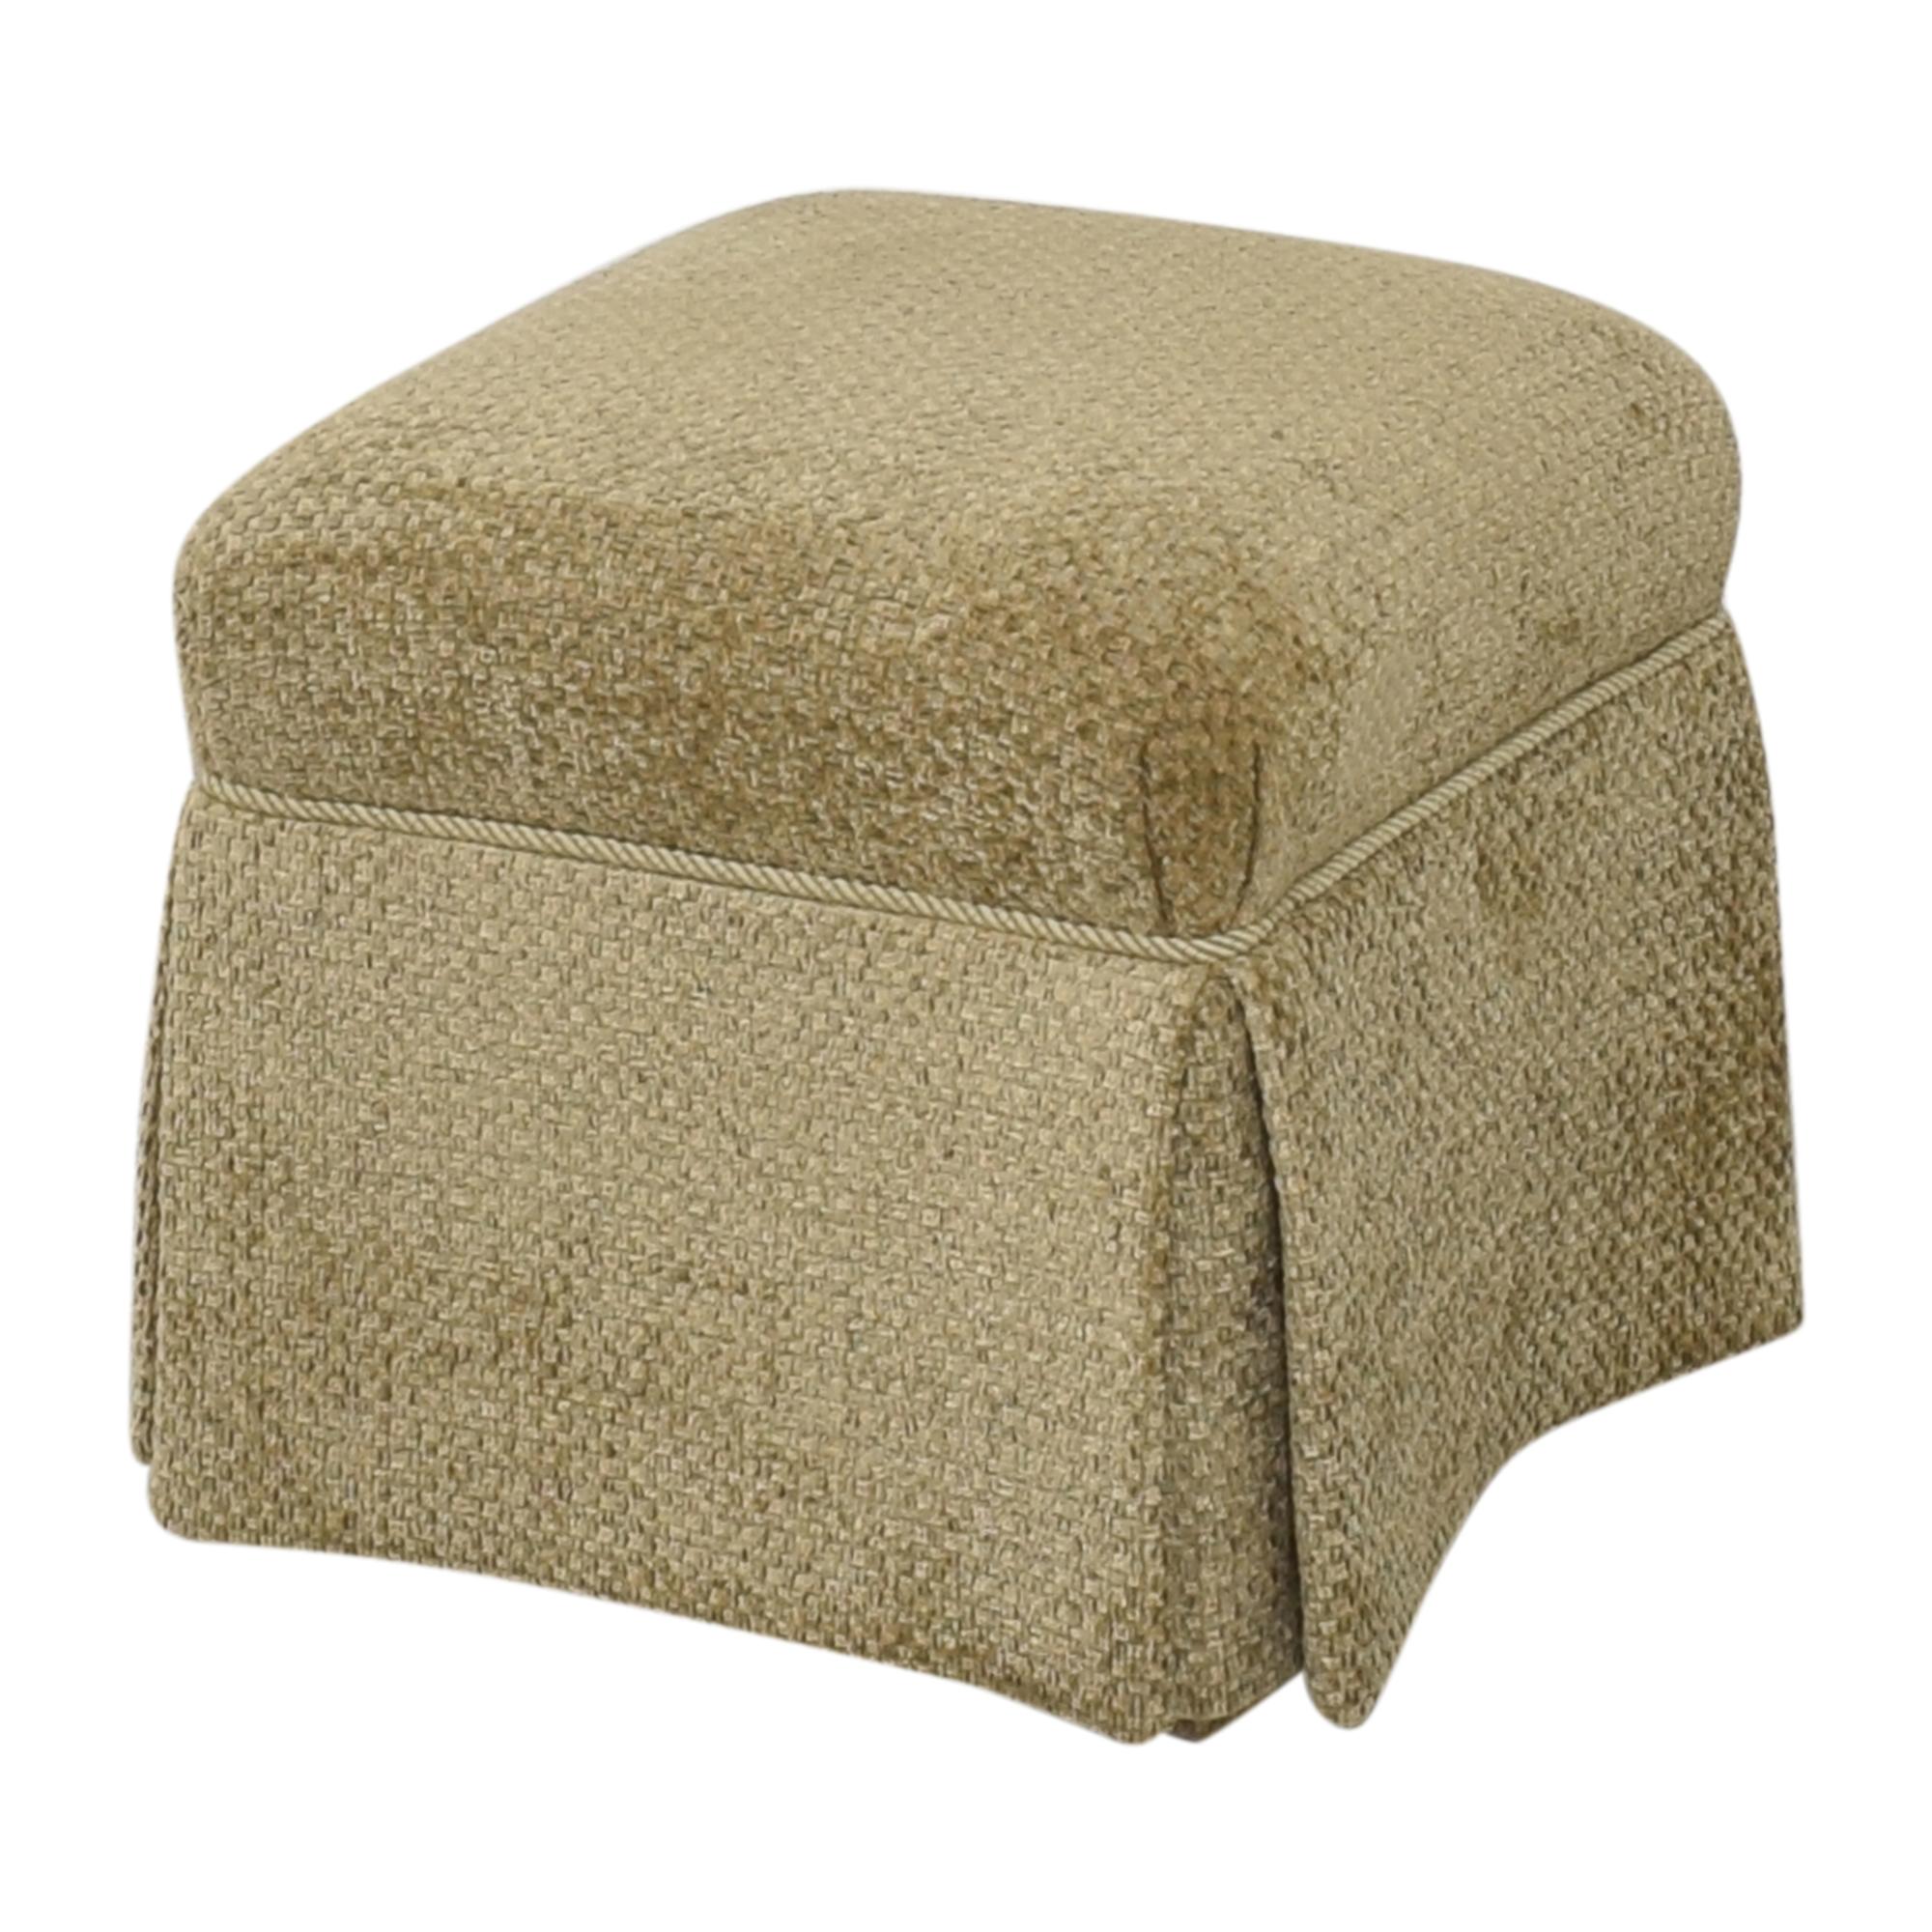 Sherrill Furniture Sherrill Furniture Skirted Ottoman ct